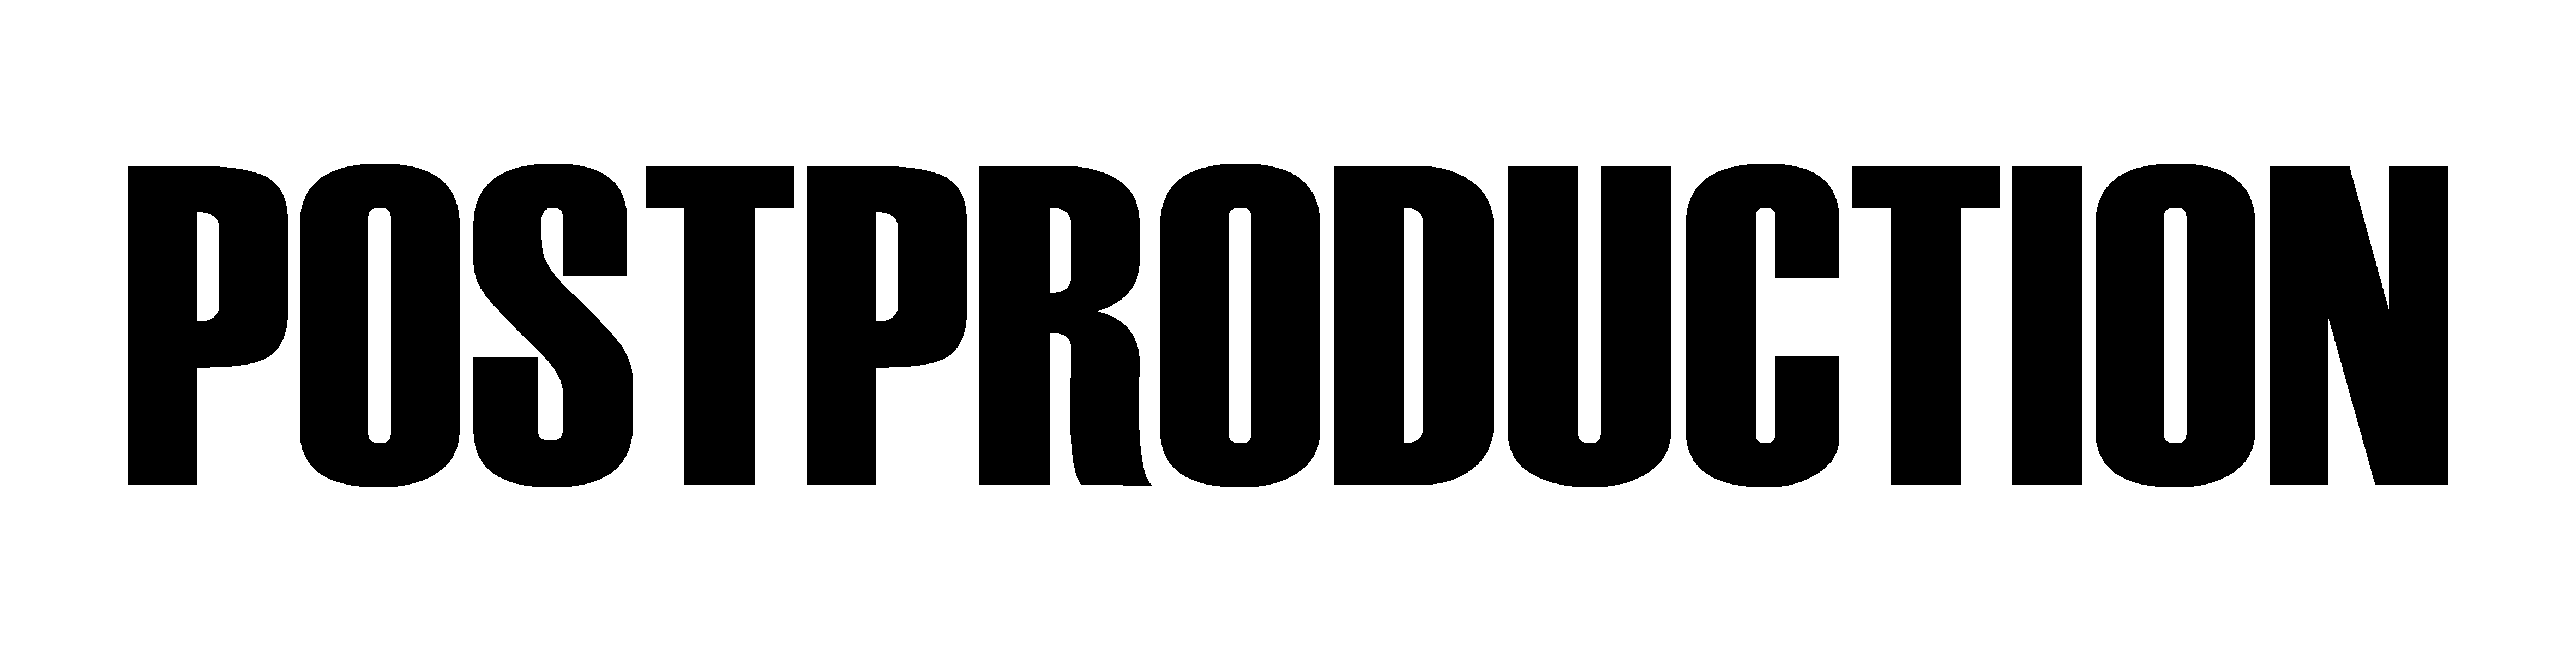 postproduction1 BLACK